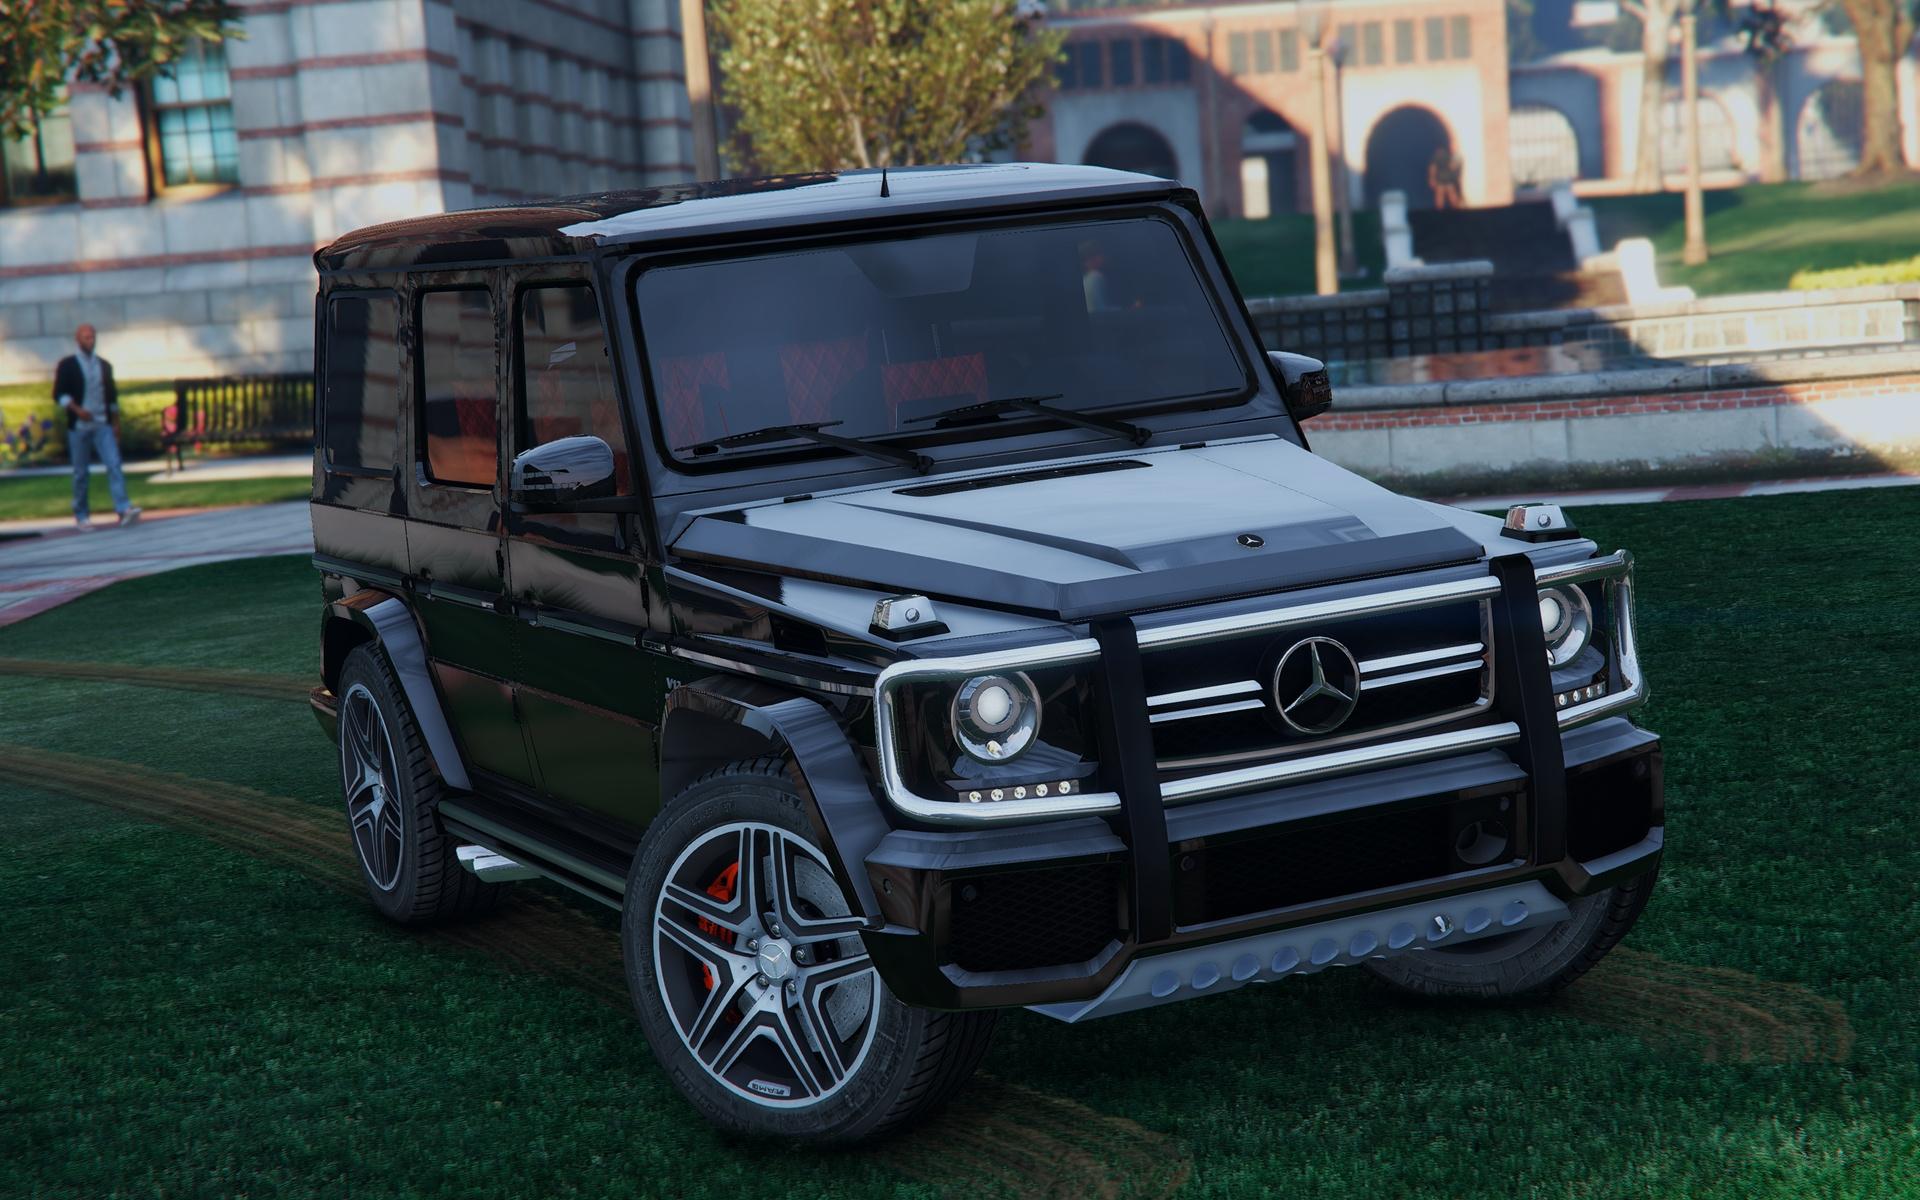 d7649a 0 167ced b5244511 orig - Mercedes G65 Amg 66